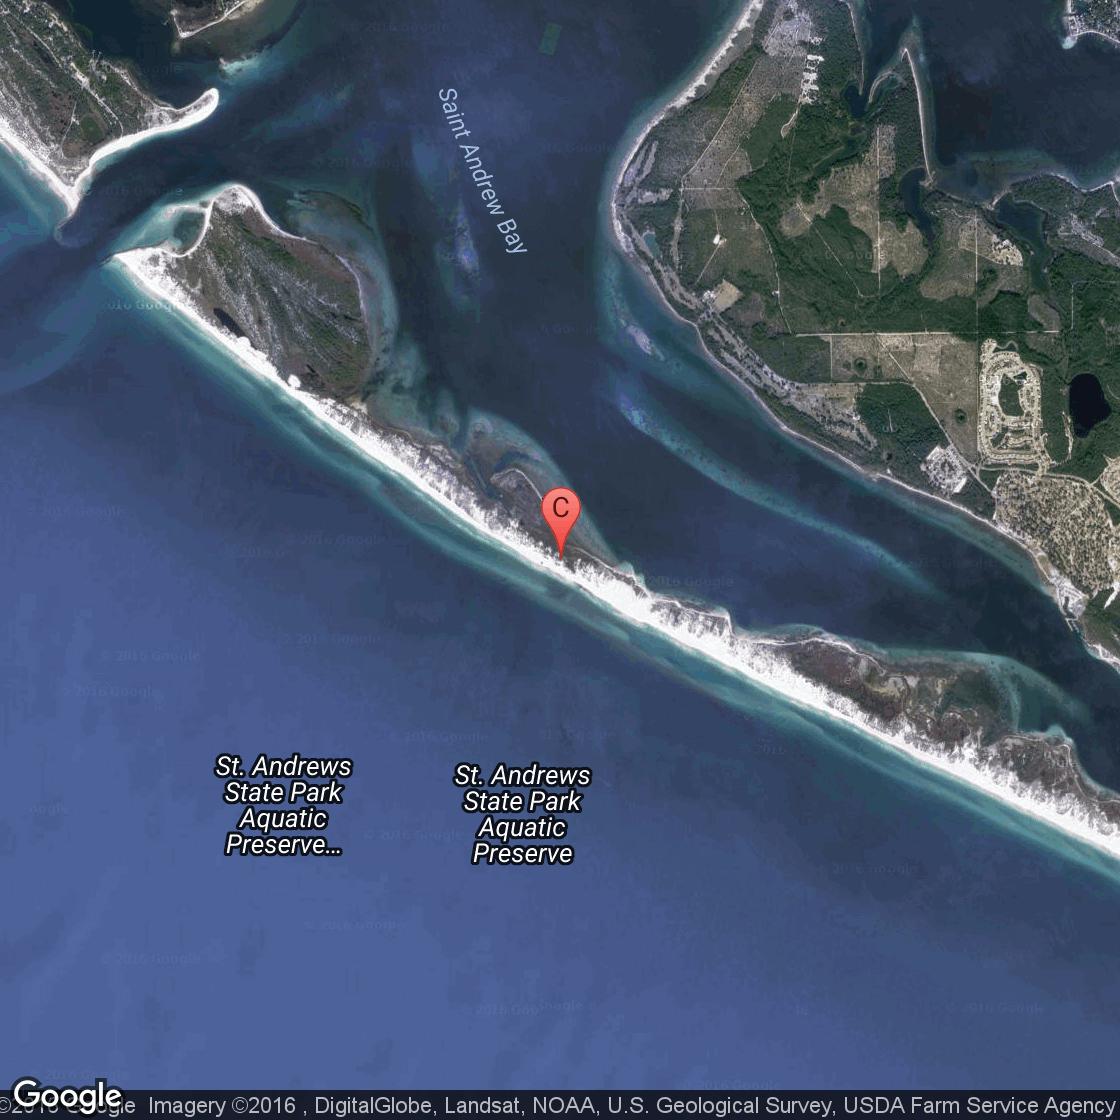 panama city boat tours to shell island | usa today